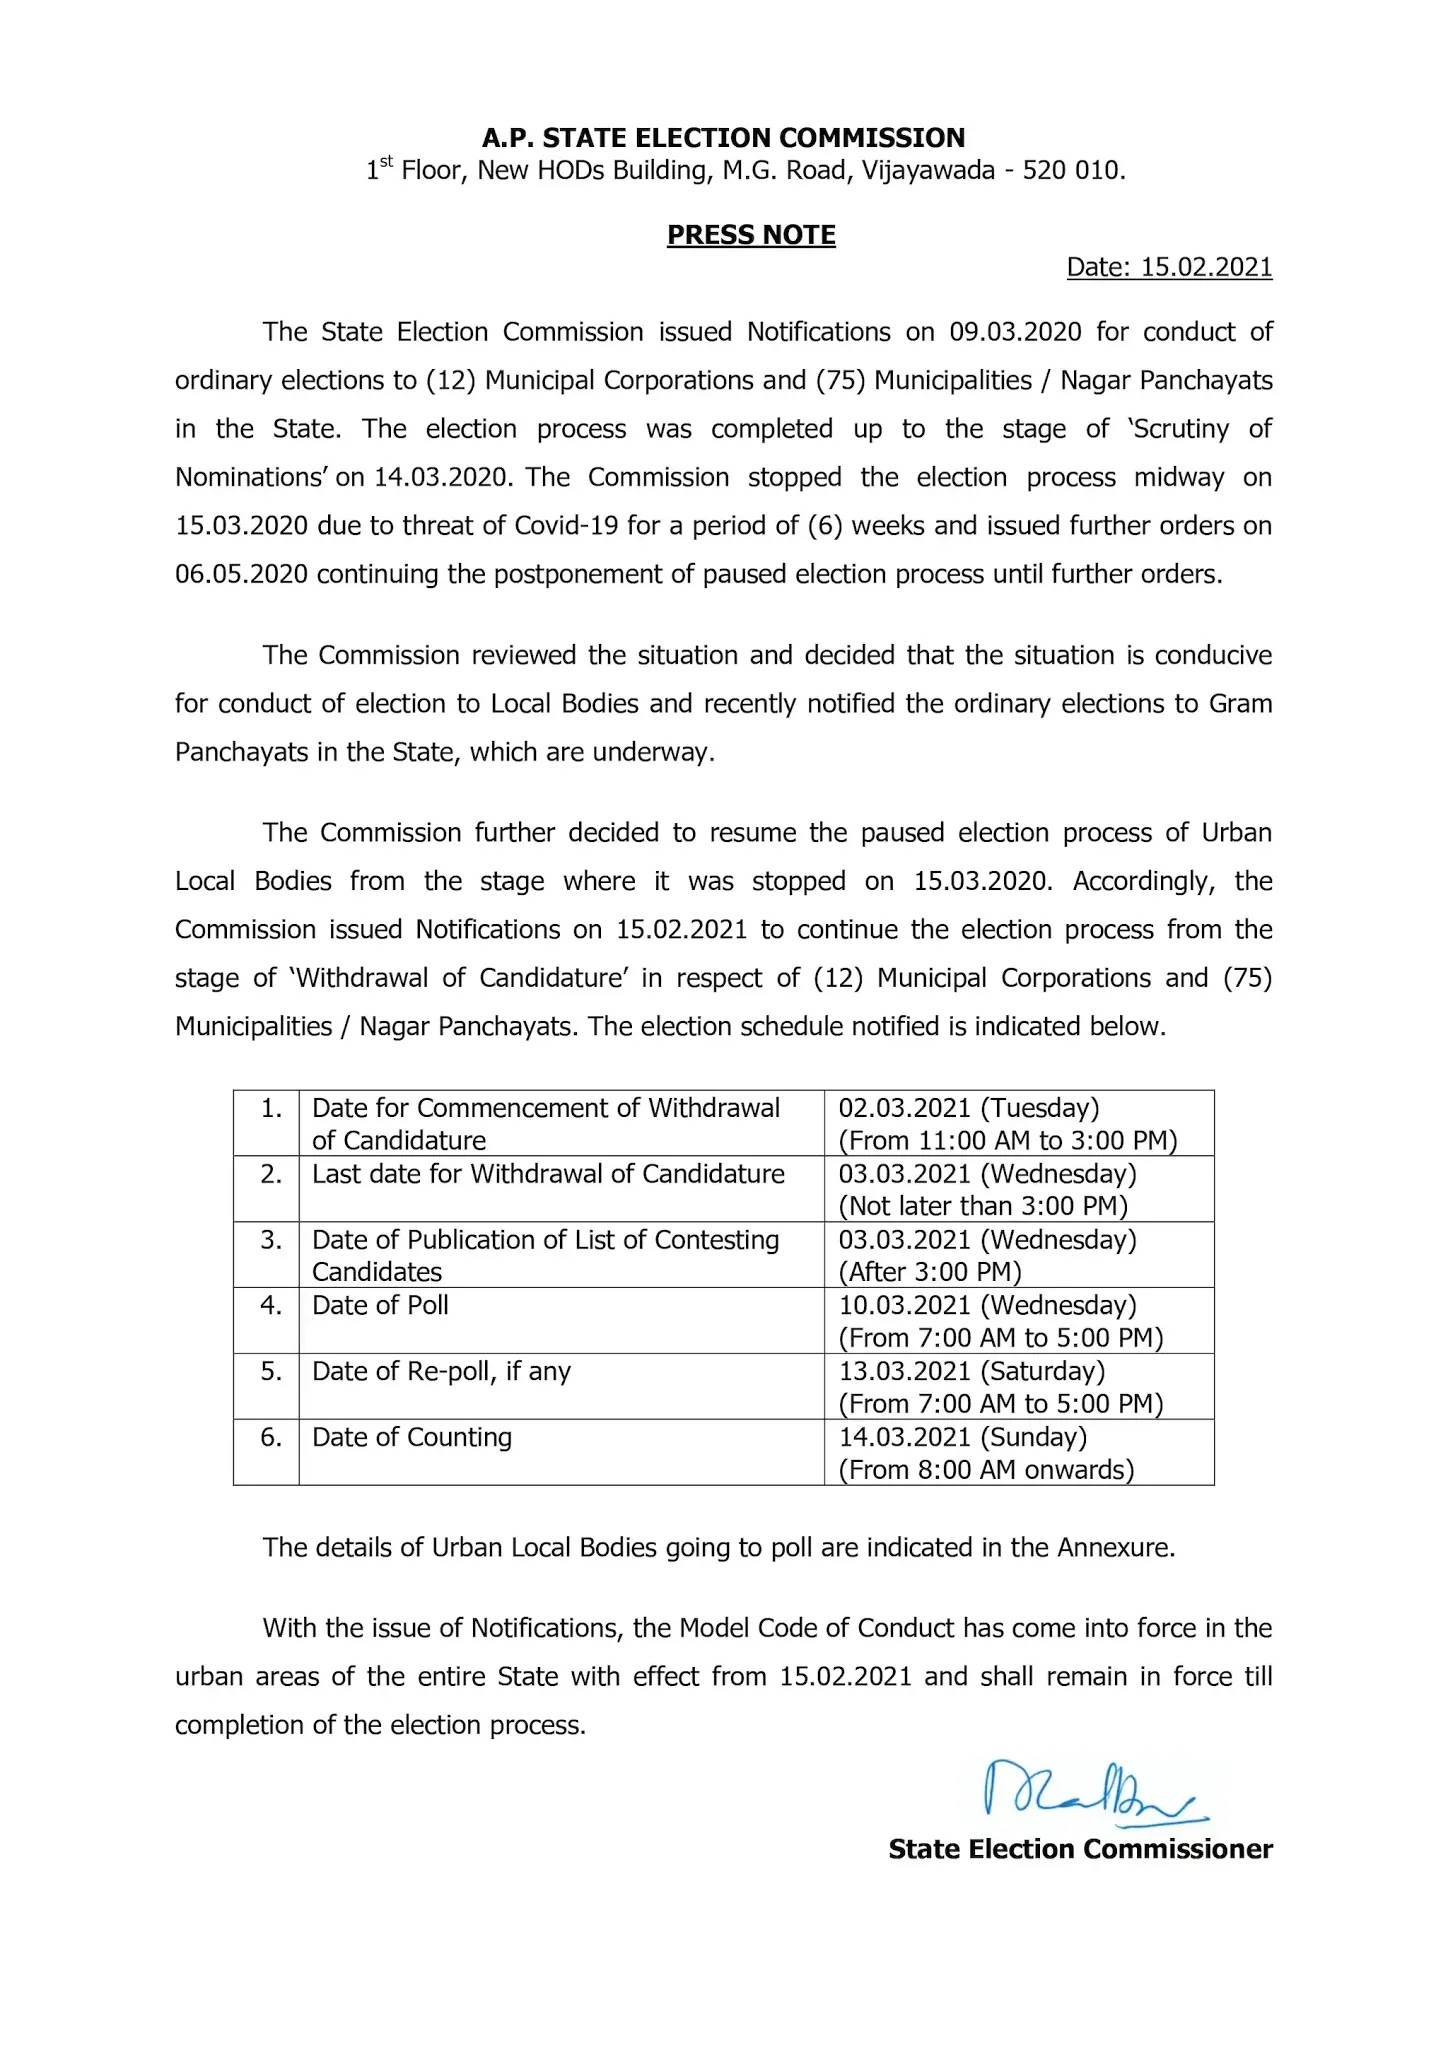 AP Municipal Elections Schedule 2021